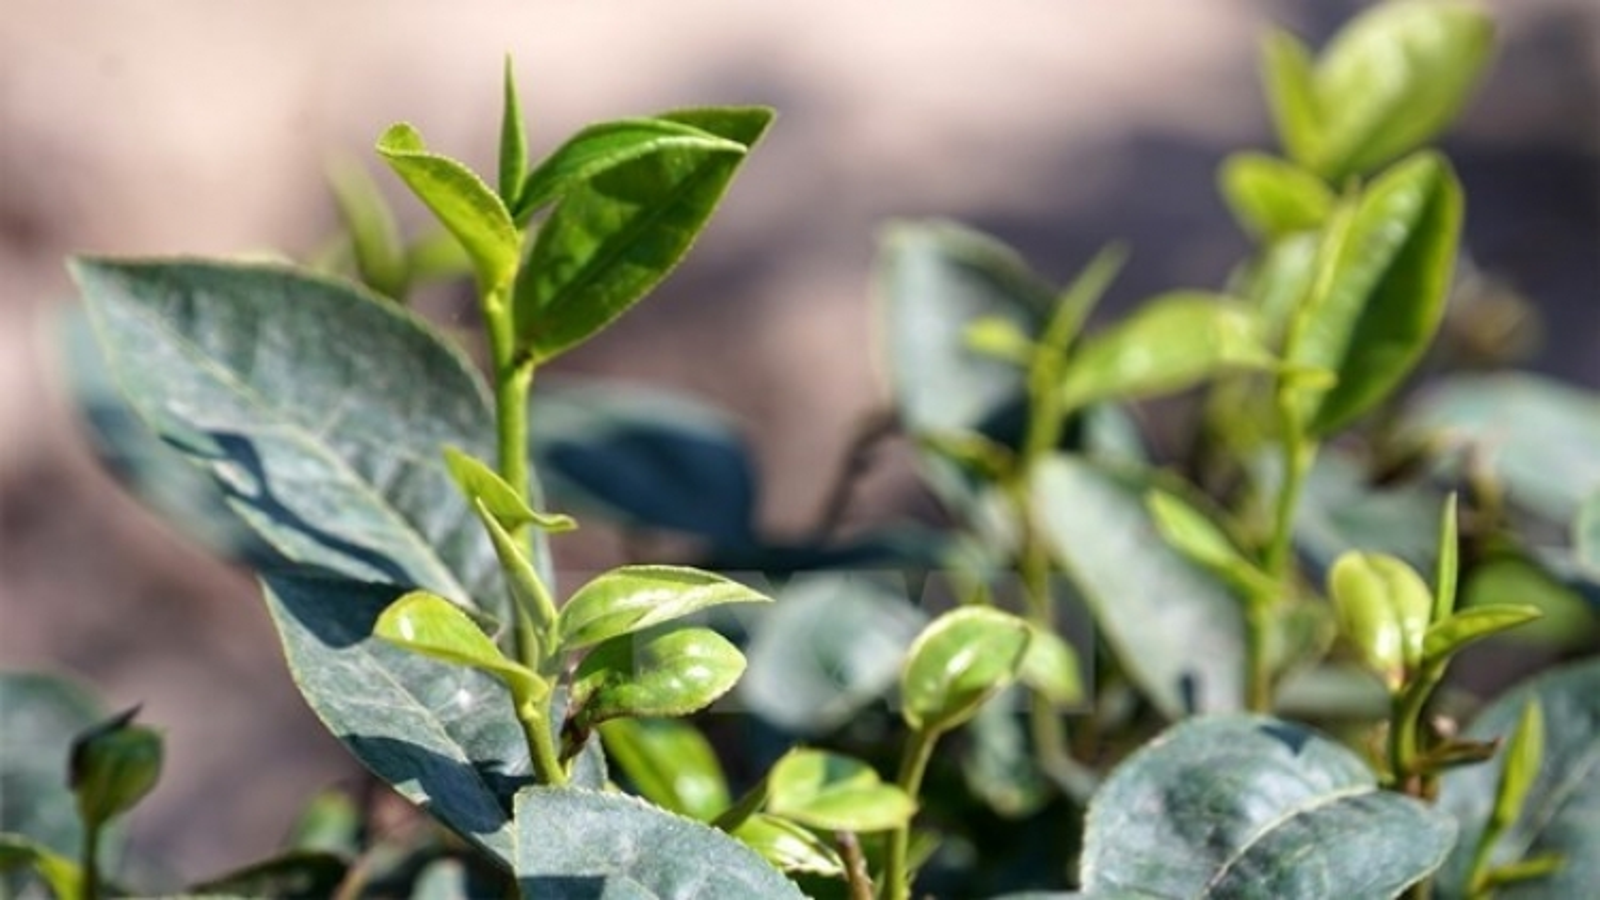 Vietnam's tea exports fall 6.9% in revenue